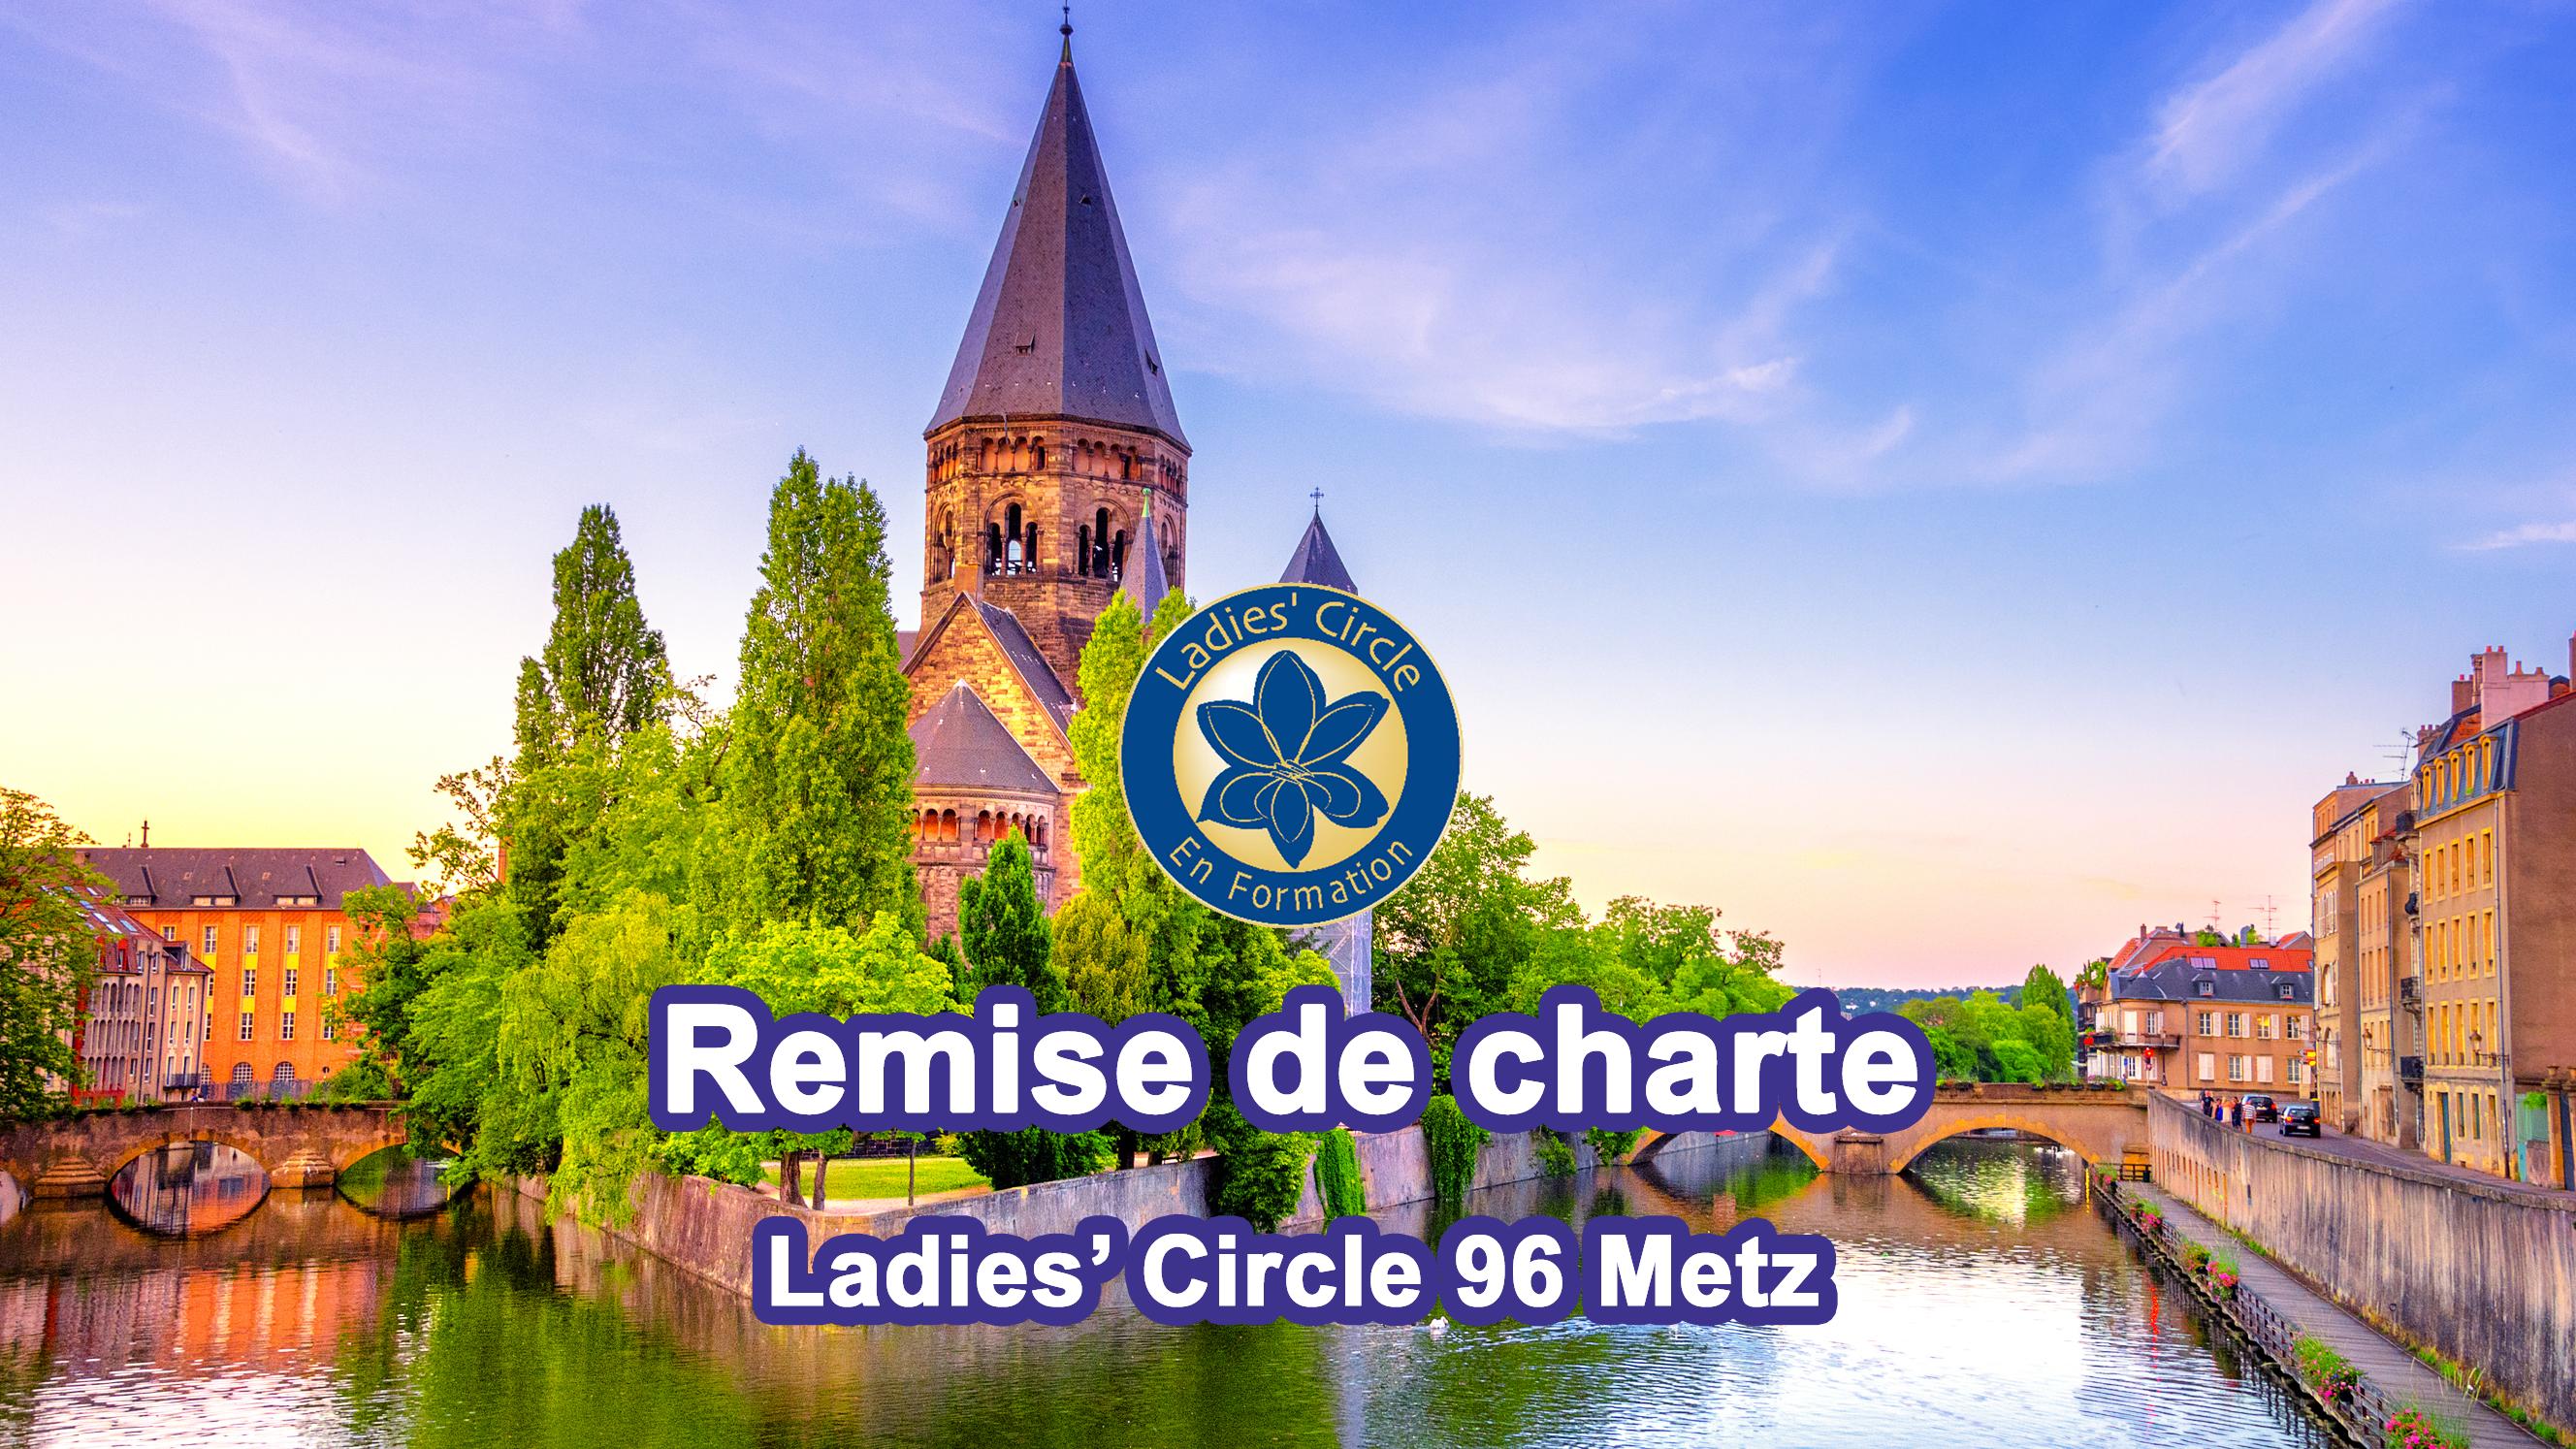 Remise de charte Ladies' Circle 96 Metz